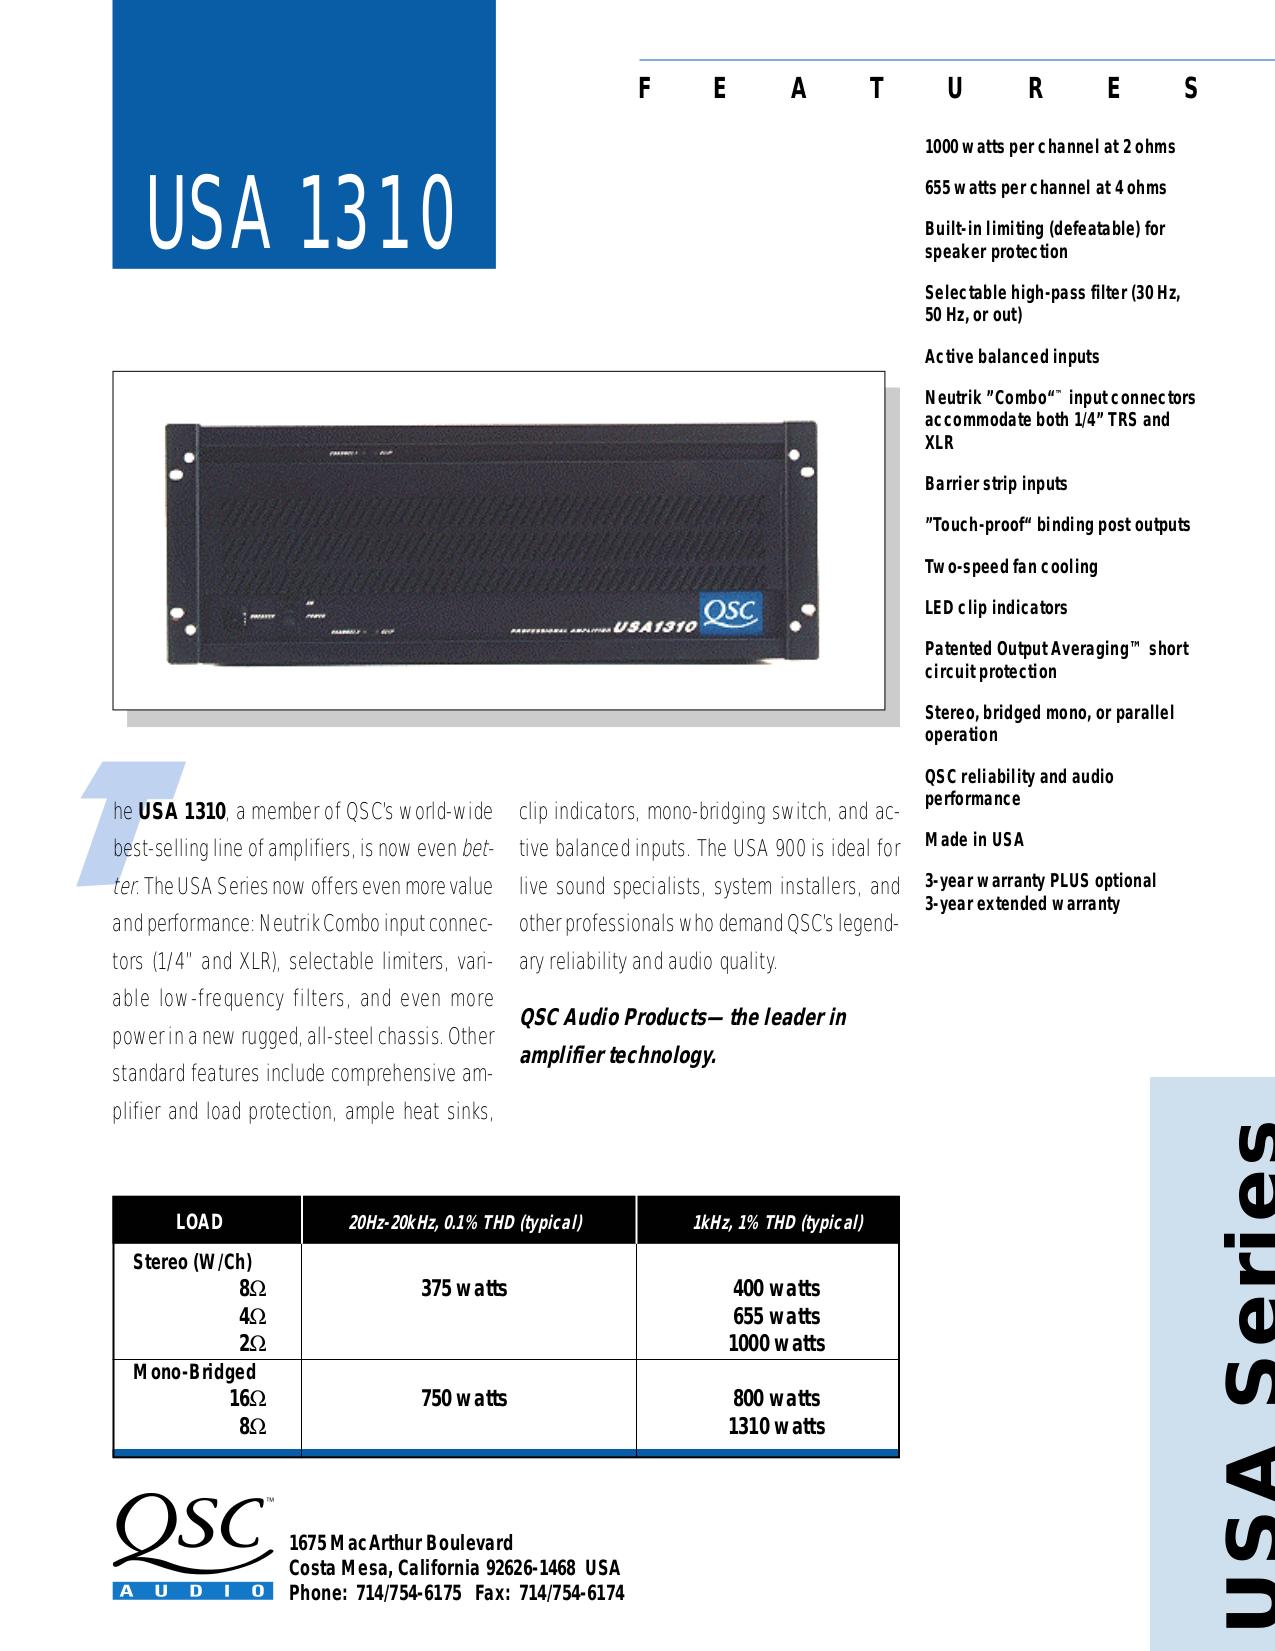 pdf for QSC Amp MX-1000a manual